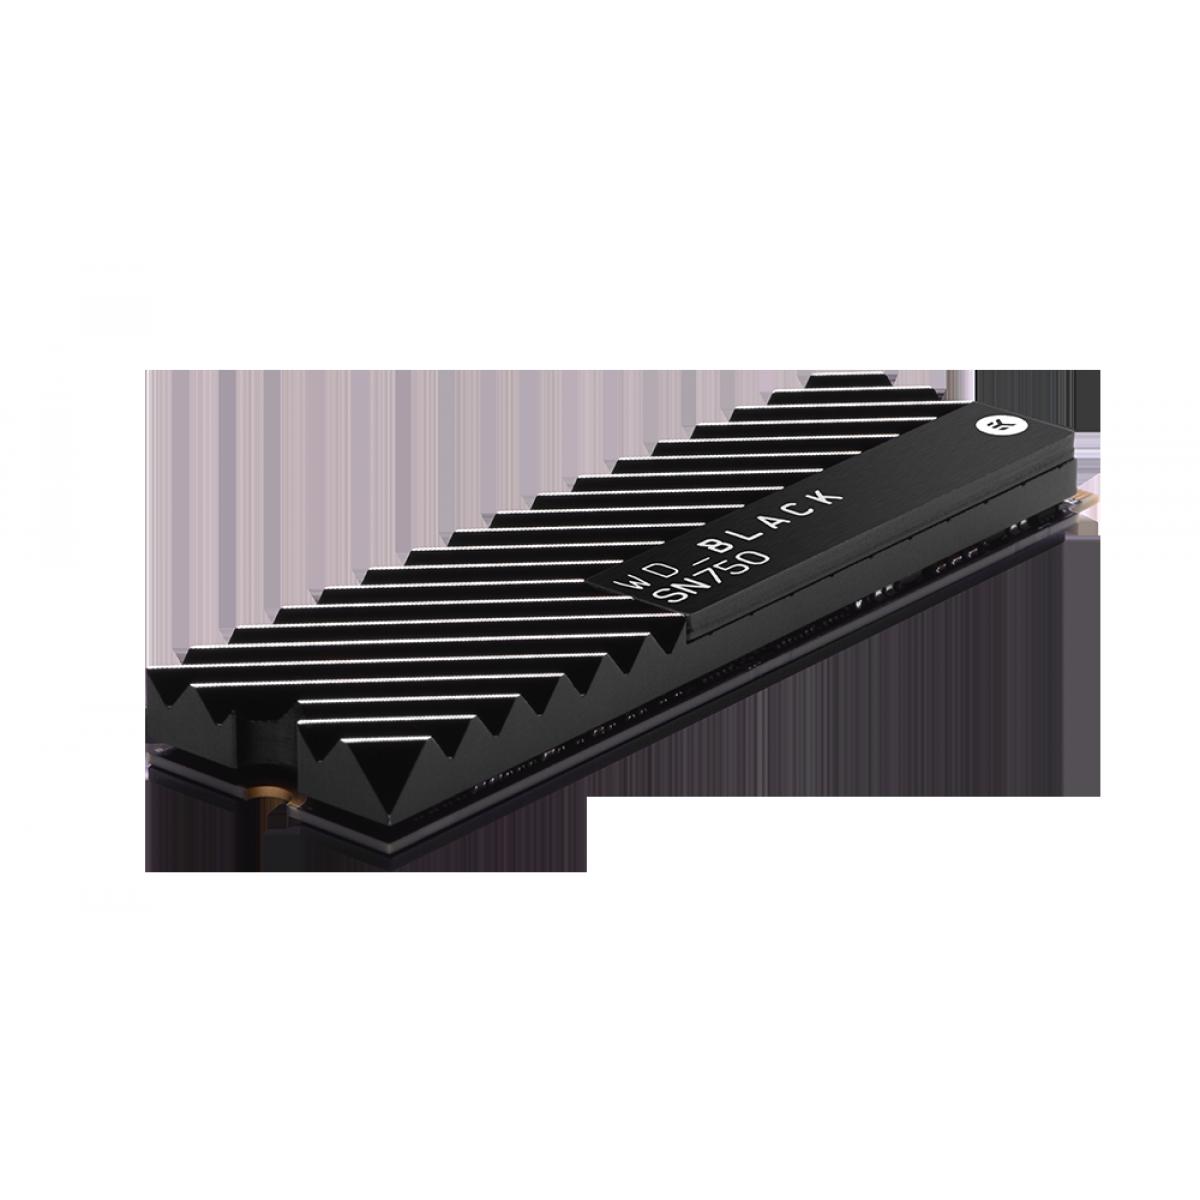 SSD WD Black SN750 2TB, M.2 2280, Nvme, Leitura 3400MBs, Gravação 2900MBs, C/Heatsink, WDS200T3XHC